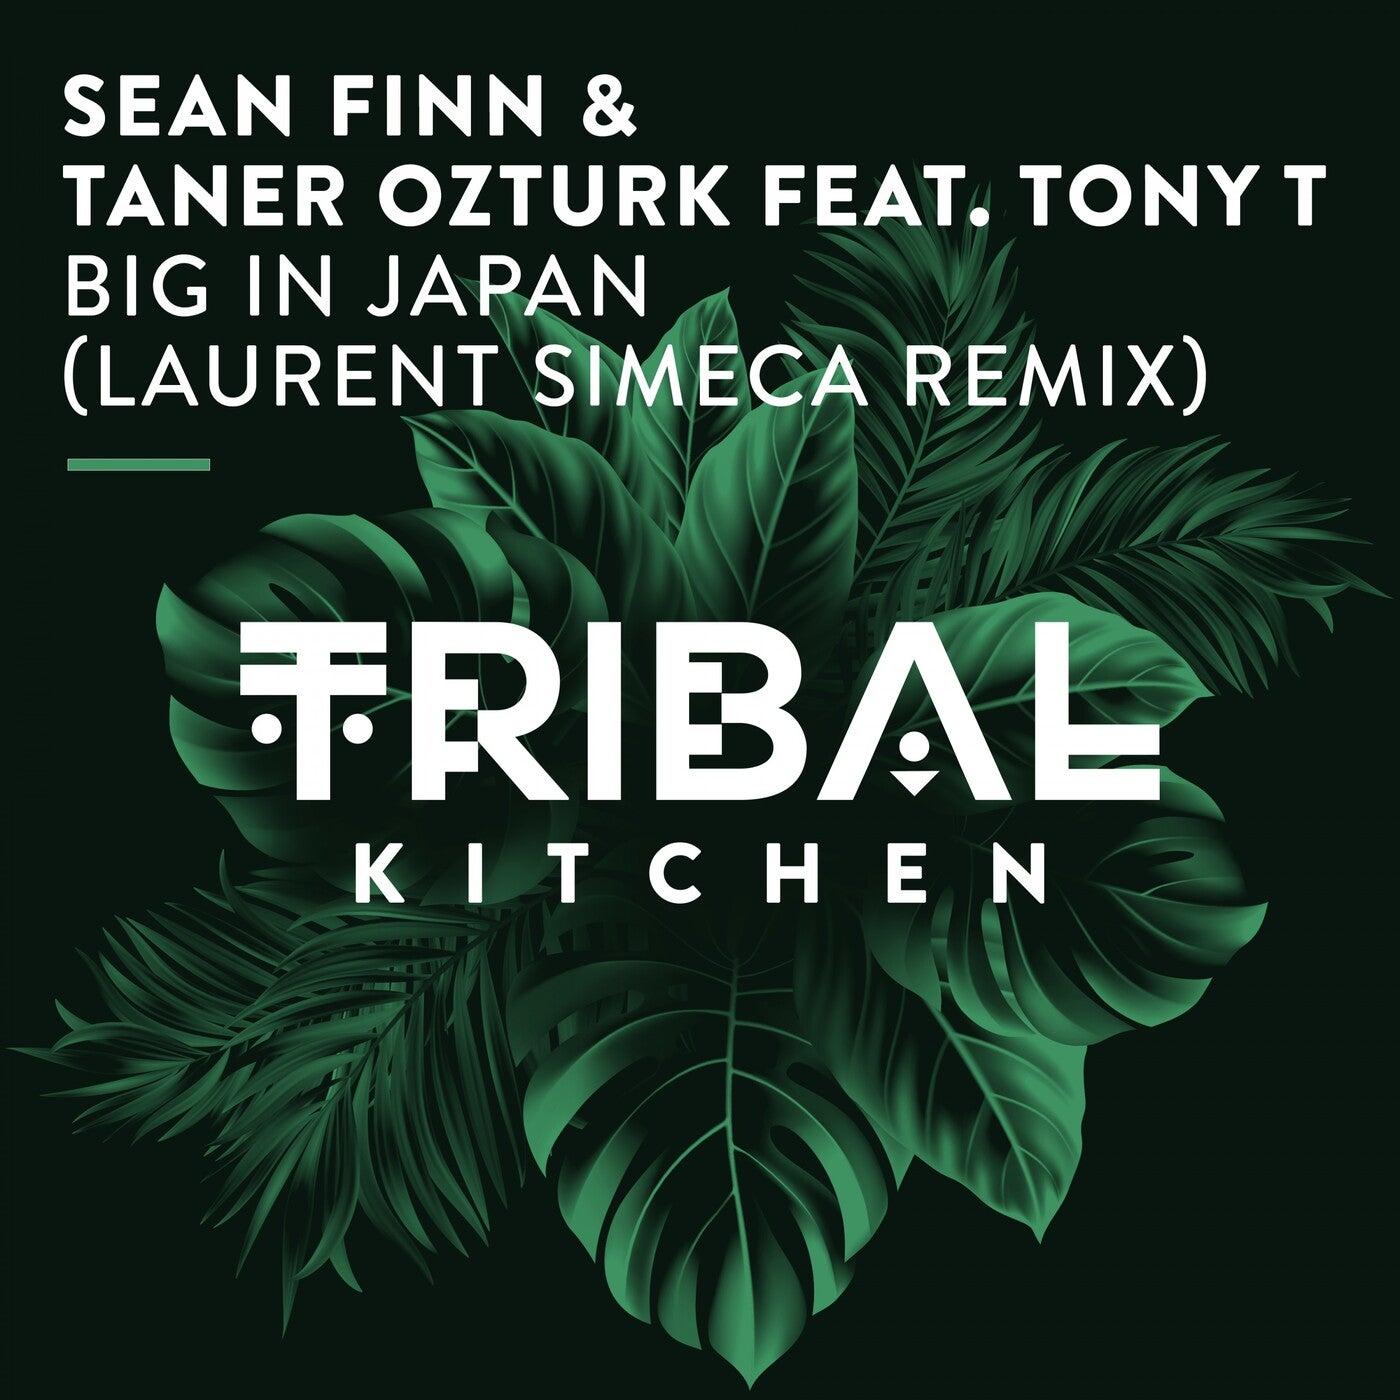 Big in Japan feat. Tony T (Laurent Simeca Remix)